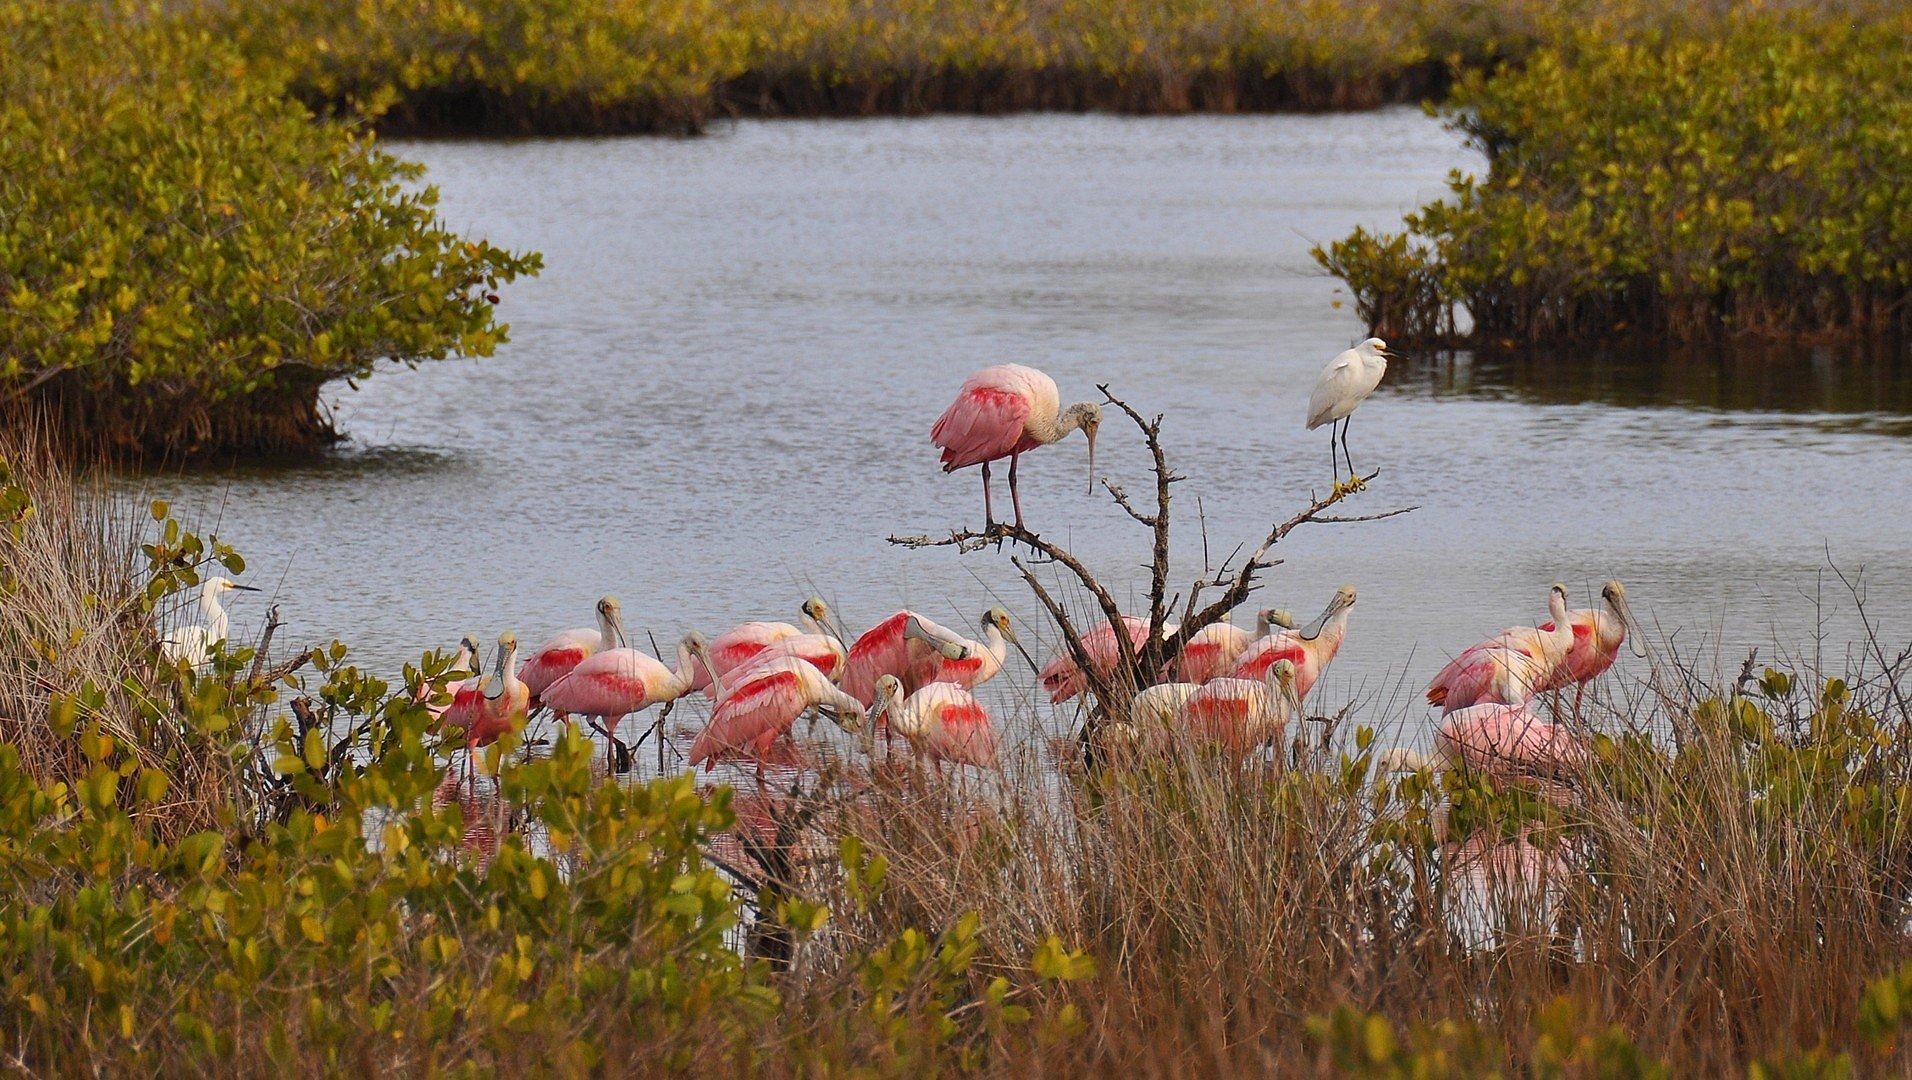 Flock of Roseate Spoonbill